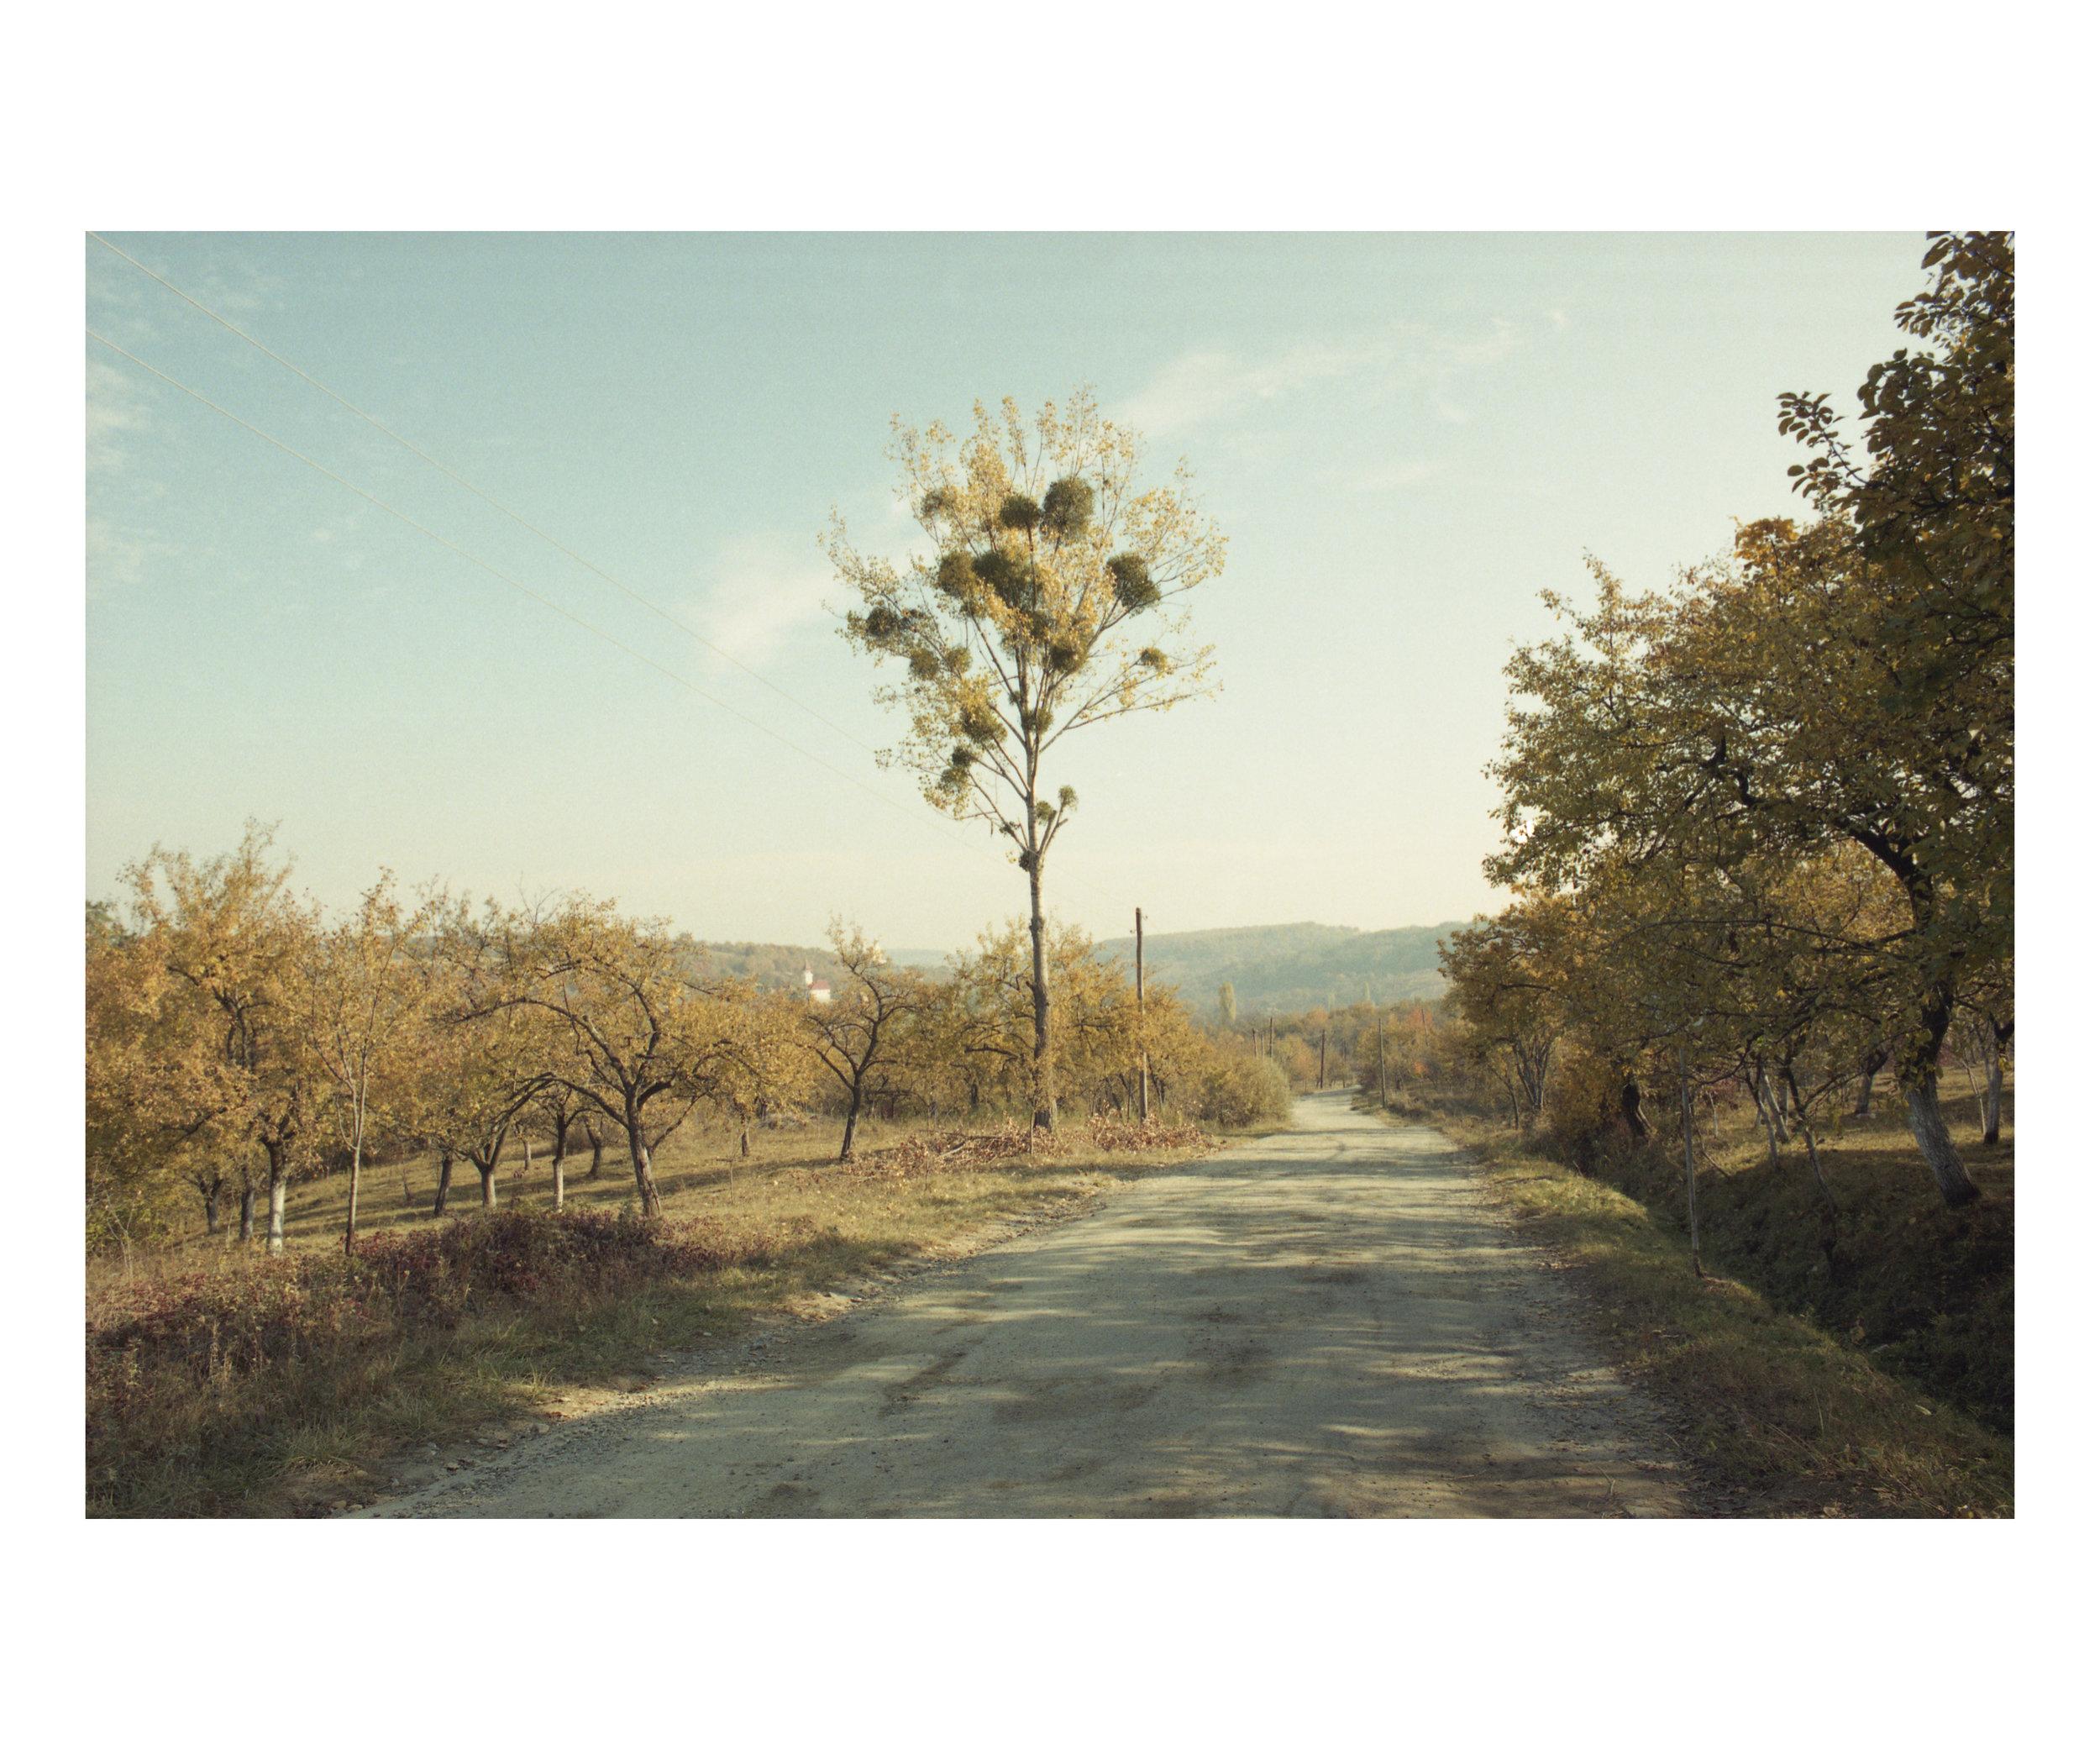 Ovidiu Gordan photobook familiar place photography Romania_51.jpg